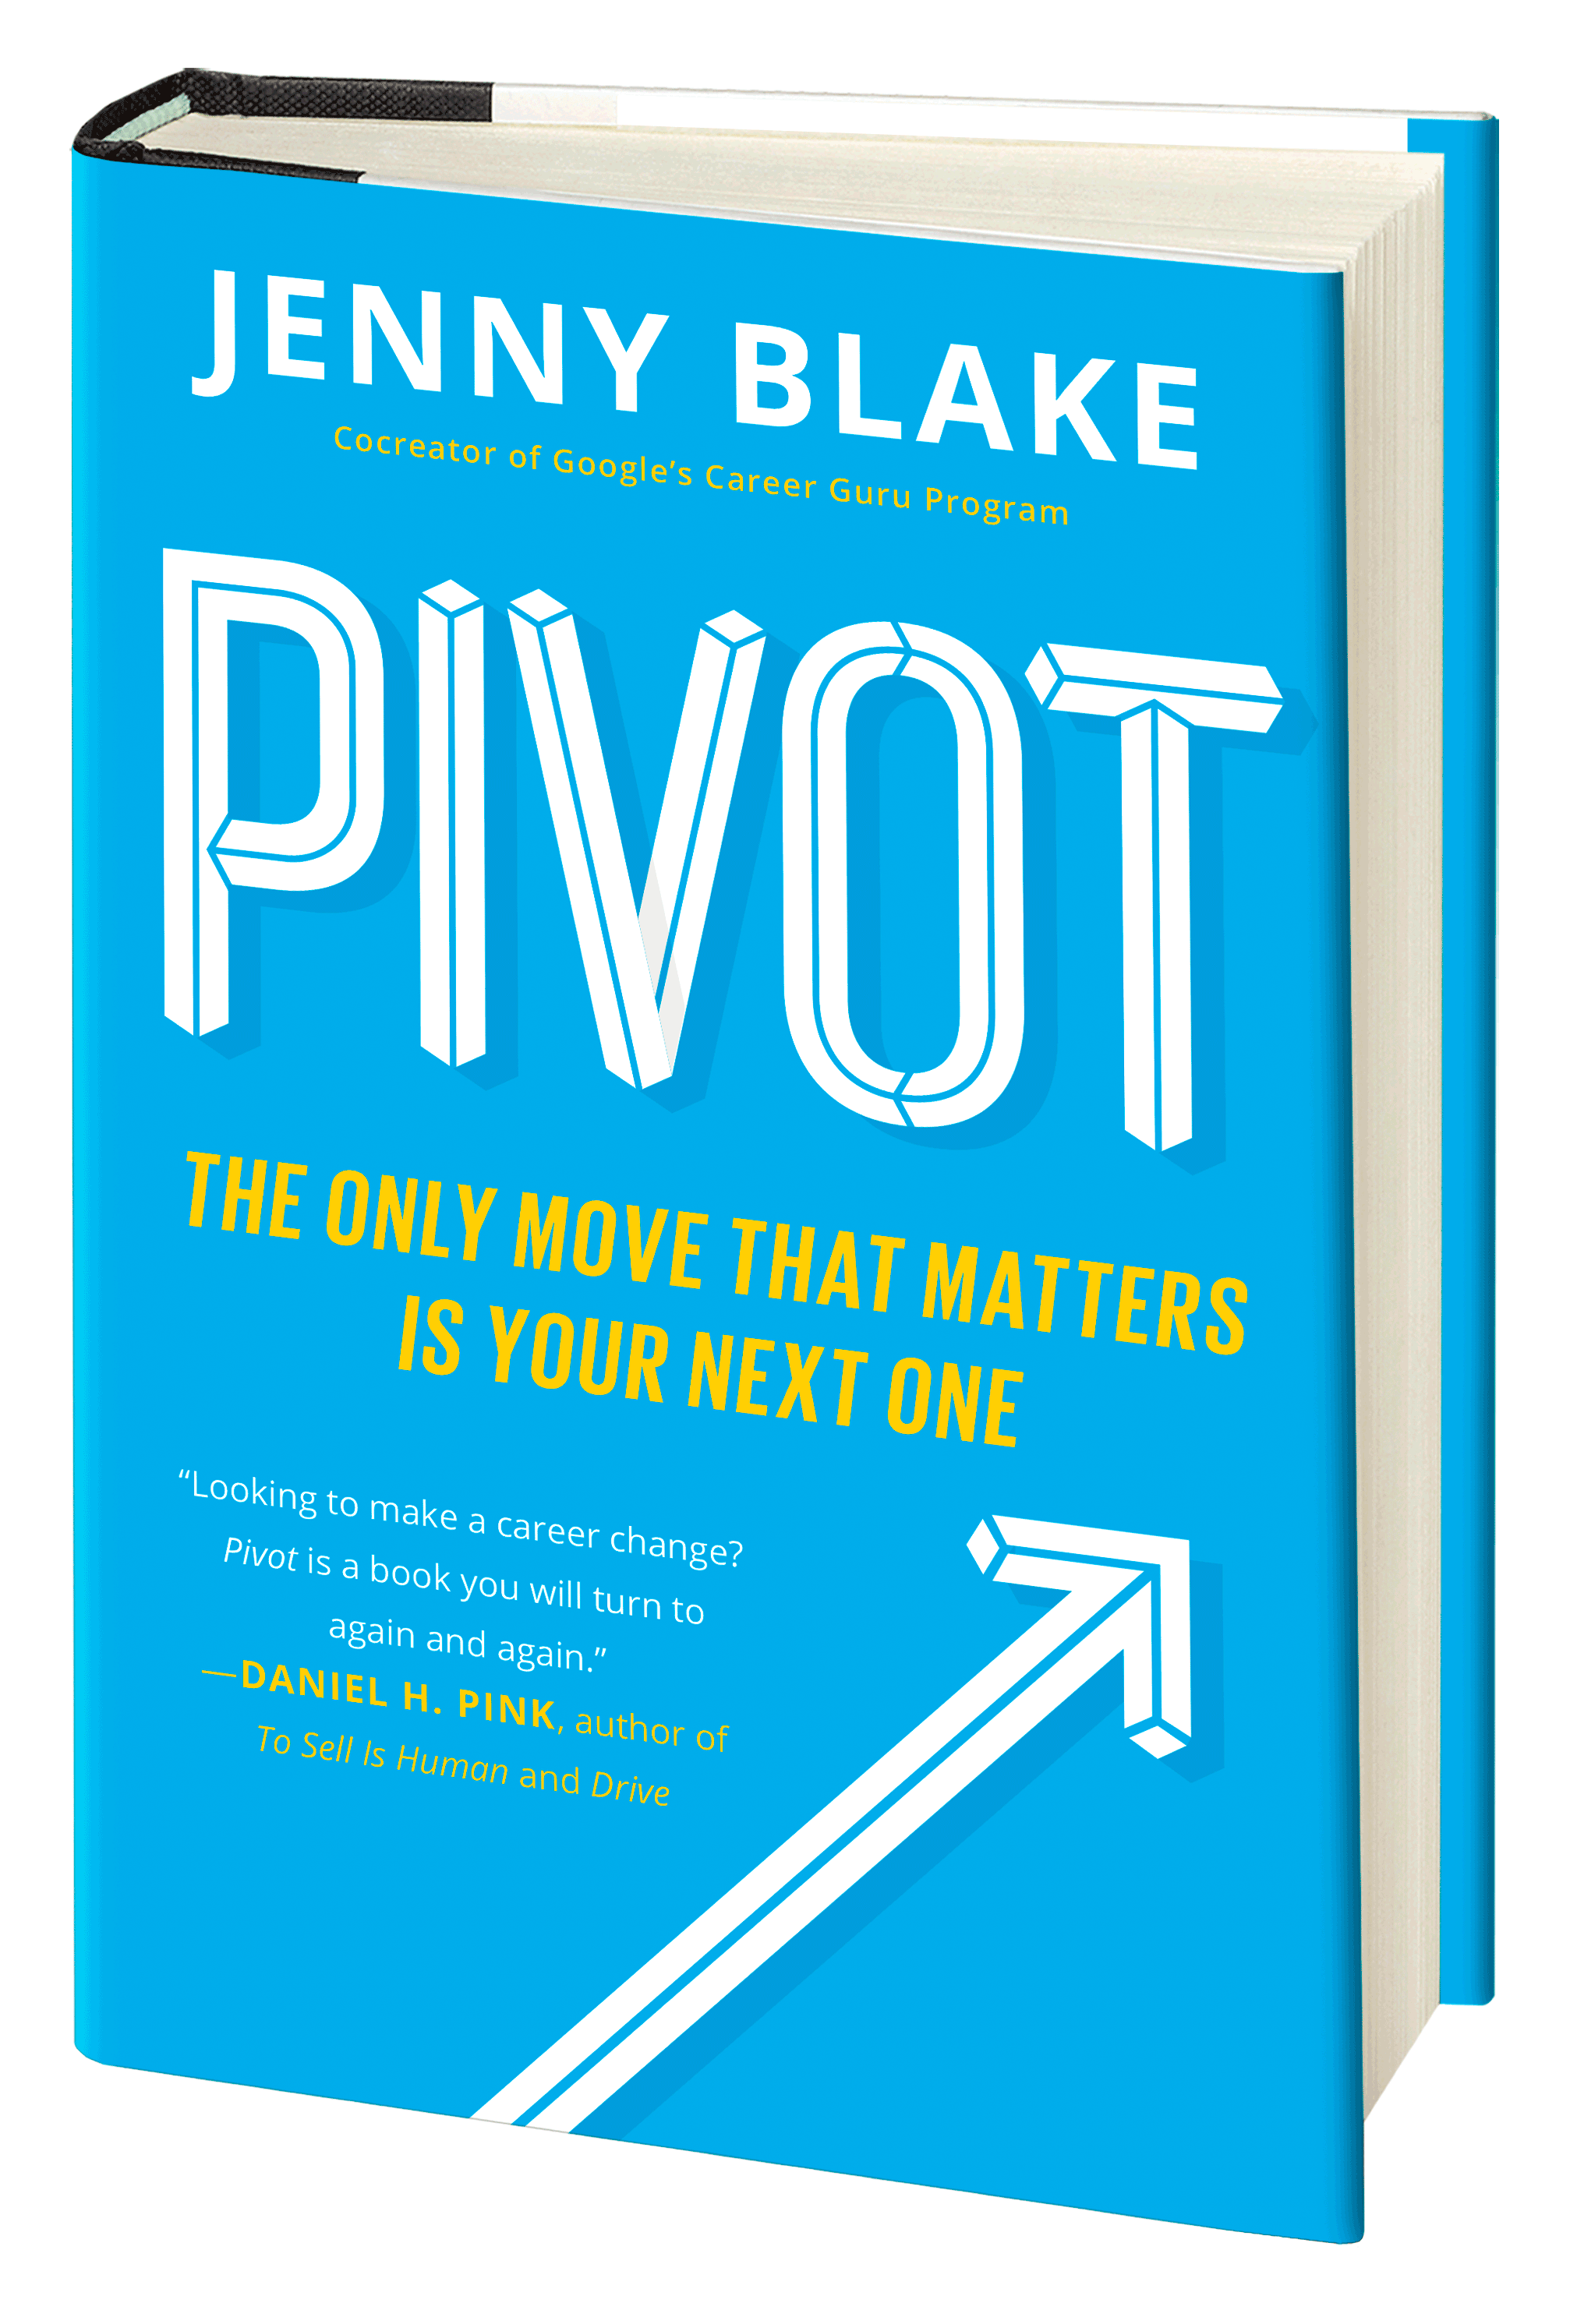 Pivot_Cover_JennyBlake